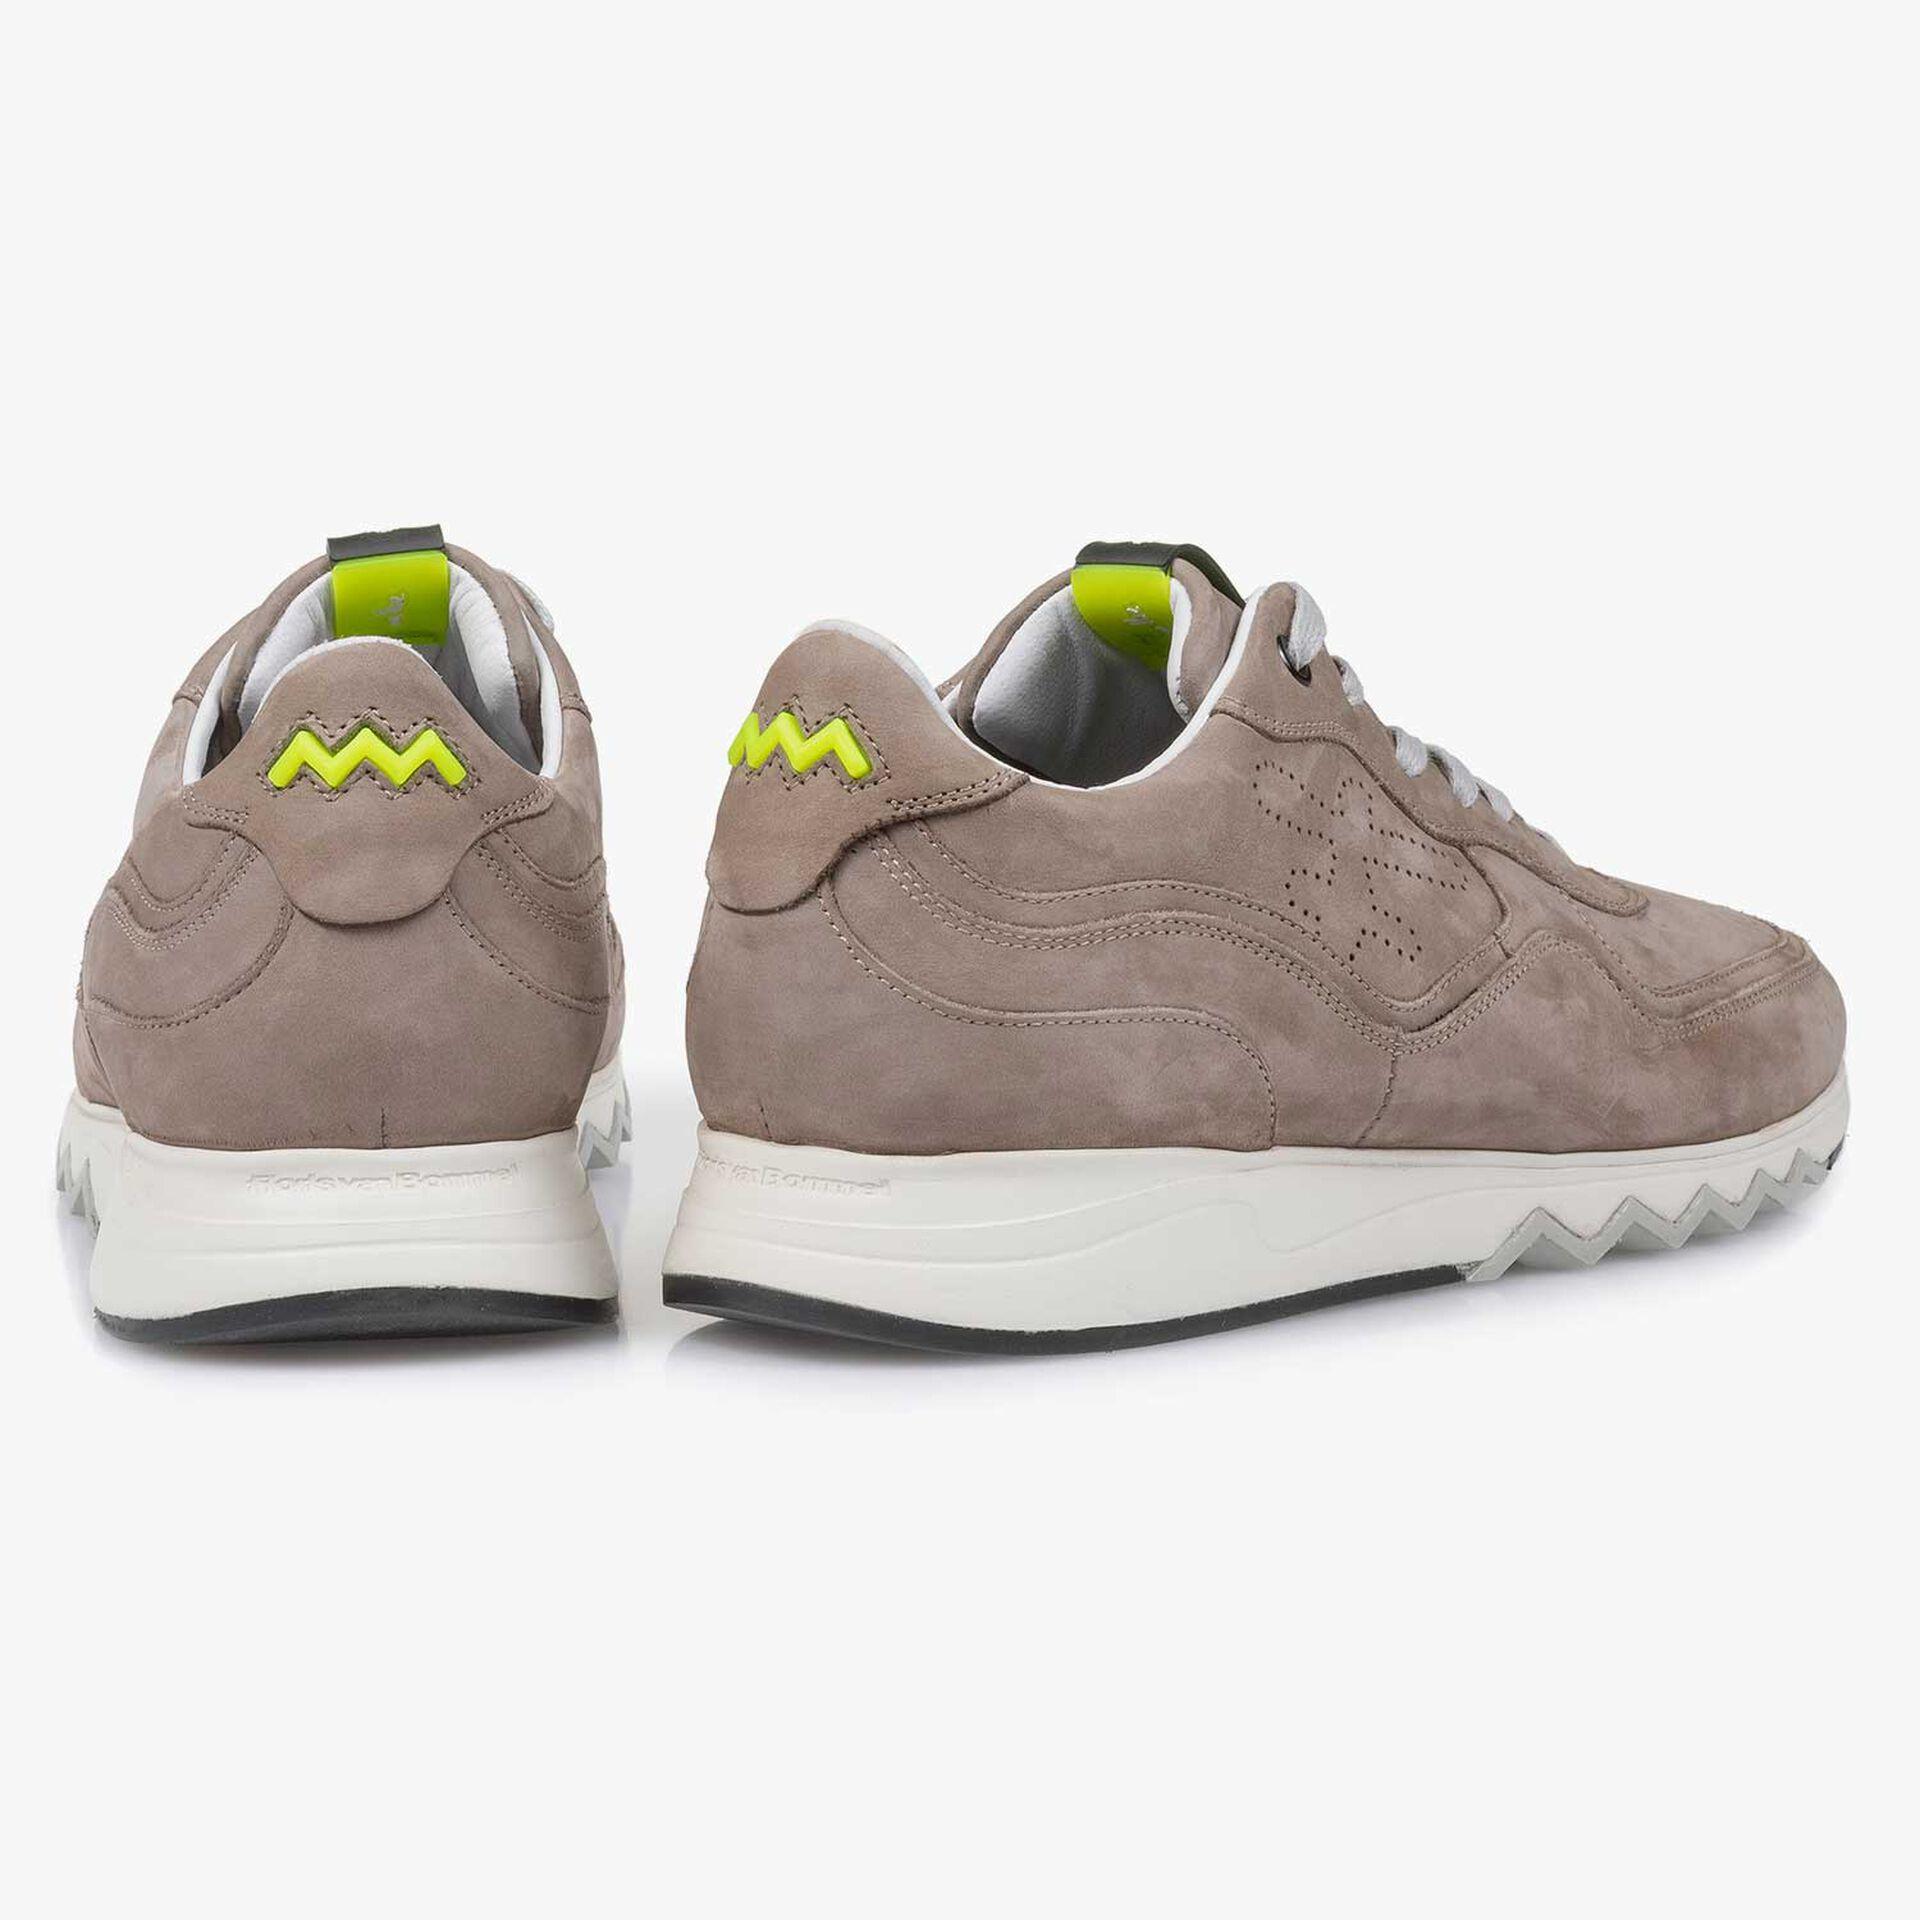 Taupefarbener Nubukleder-Sneaker